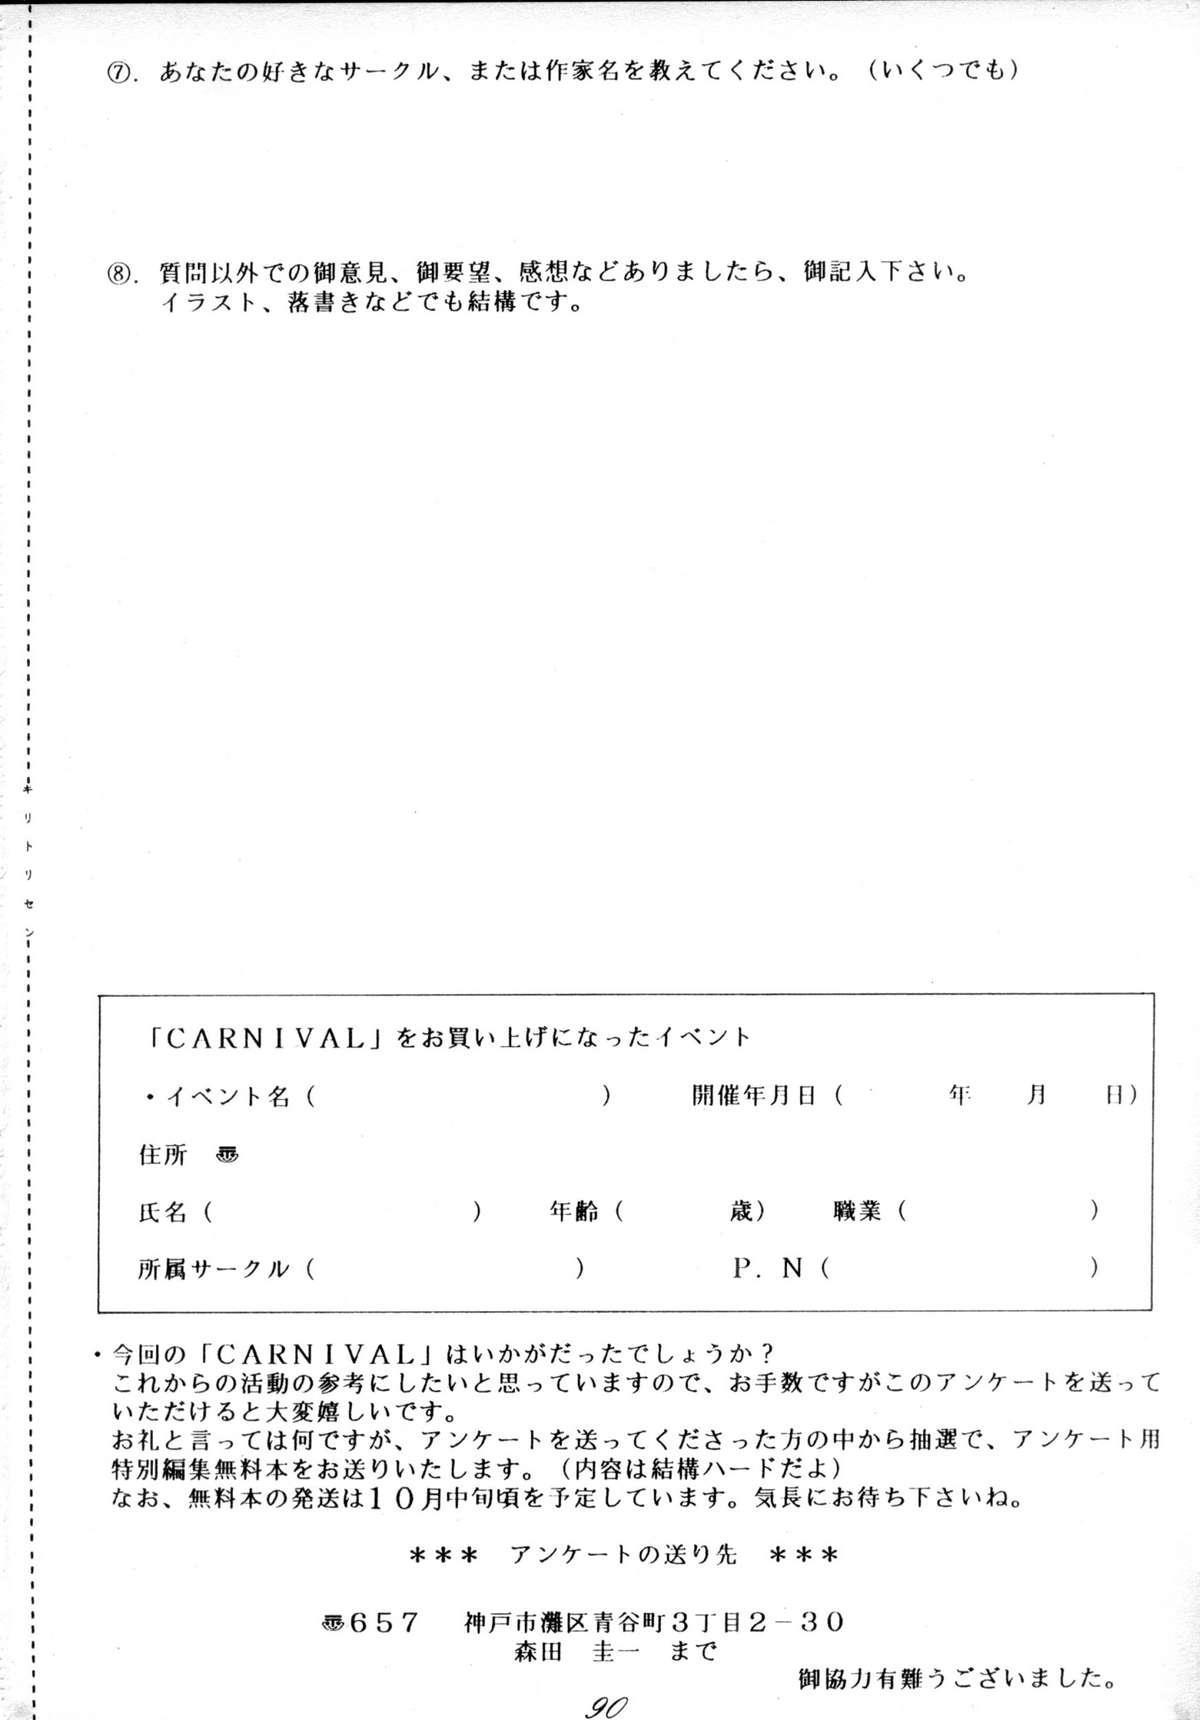 Muyou Yarou A-Team 4 Carnival 88